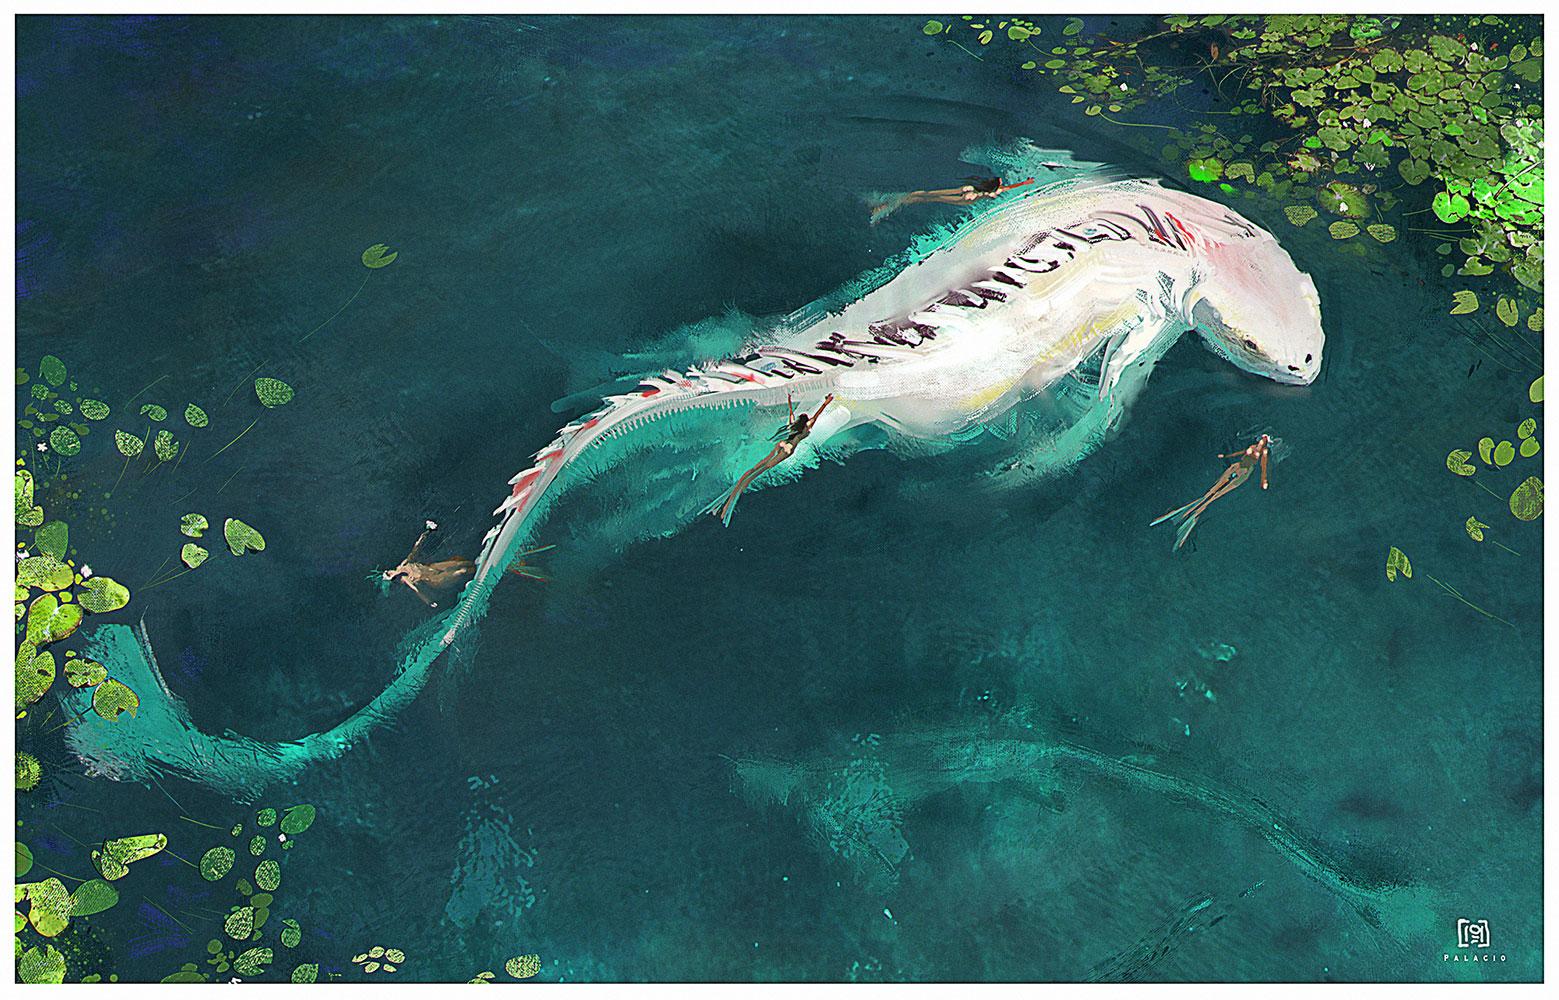 fredpalacio_dragon02_Mermaid_lamia_Albinos_FINAL_th.jpg